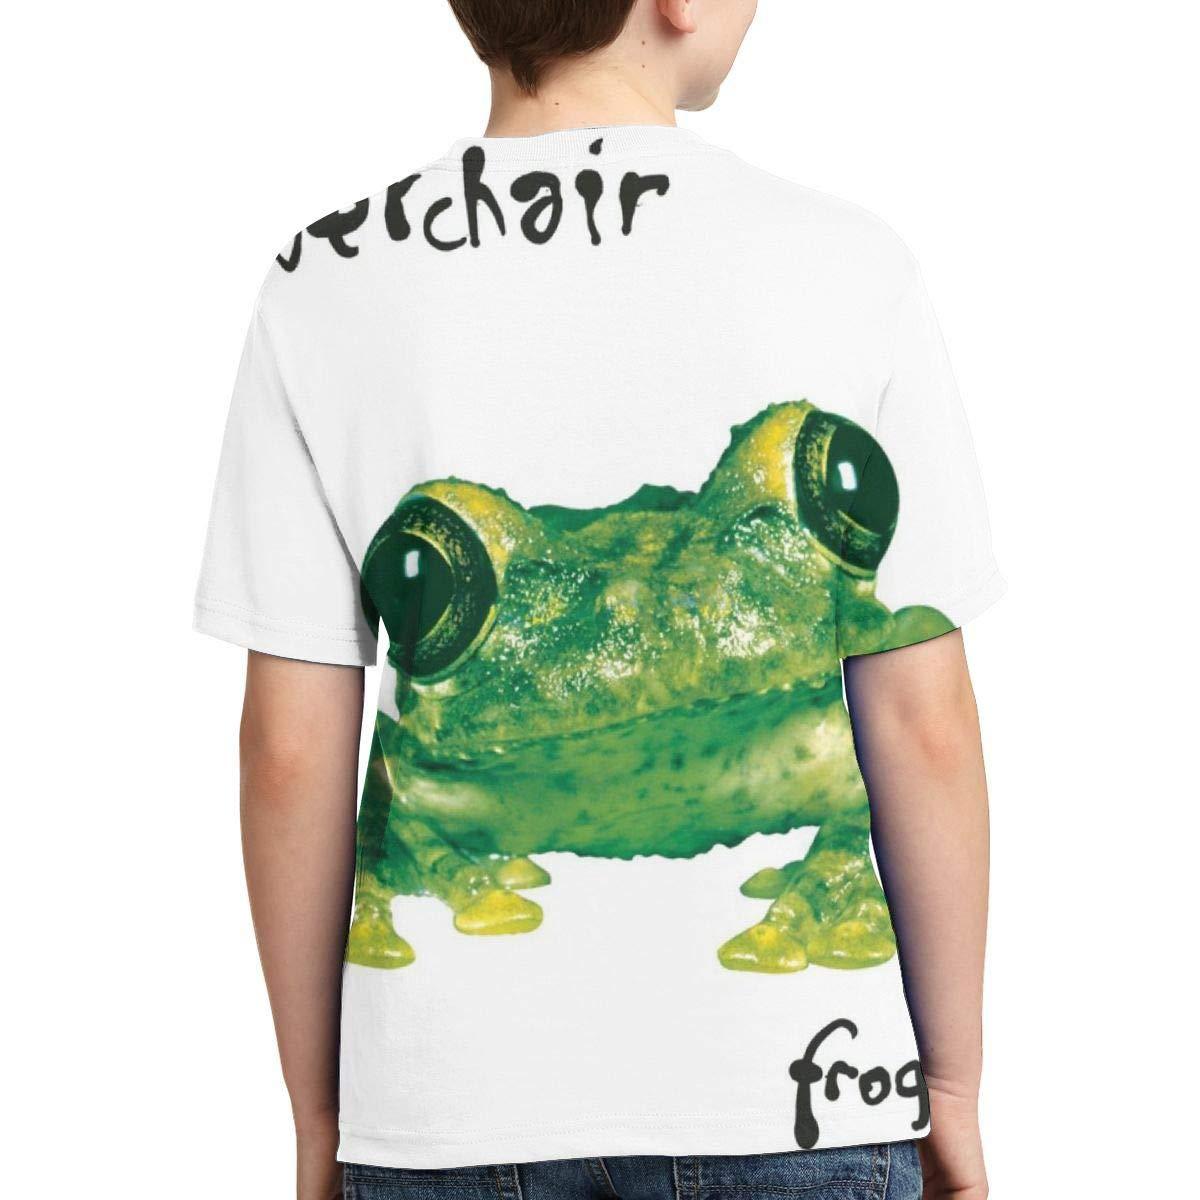 BowersJ Childs Silverchair Frogstomp Design 3D Printed Short Sleeve Tee for Girls /& Boys Black